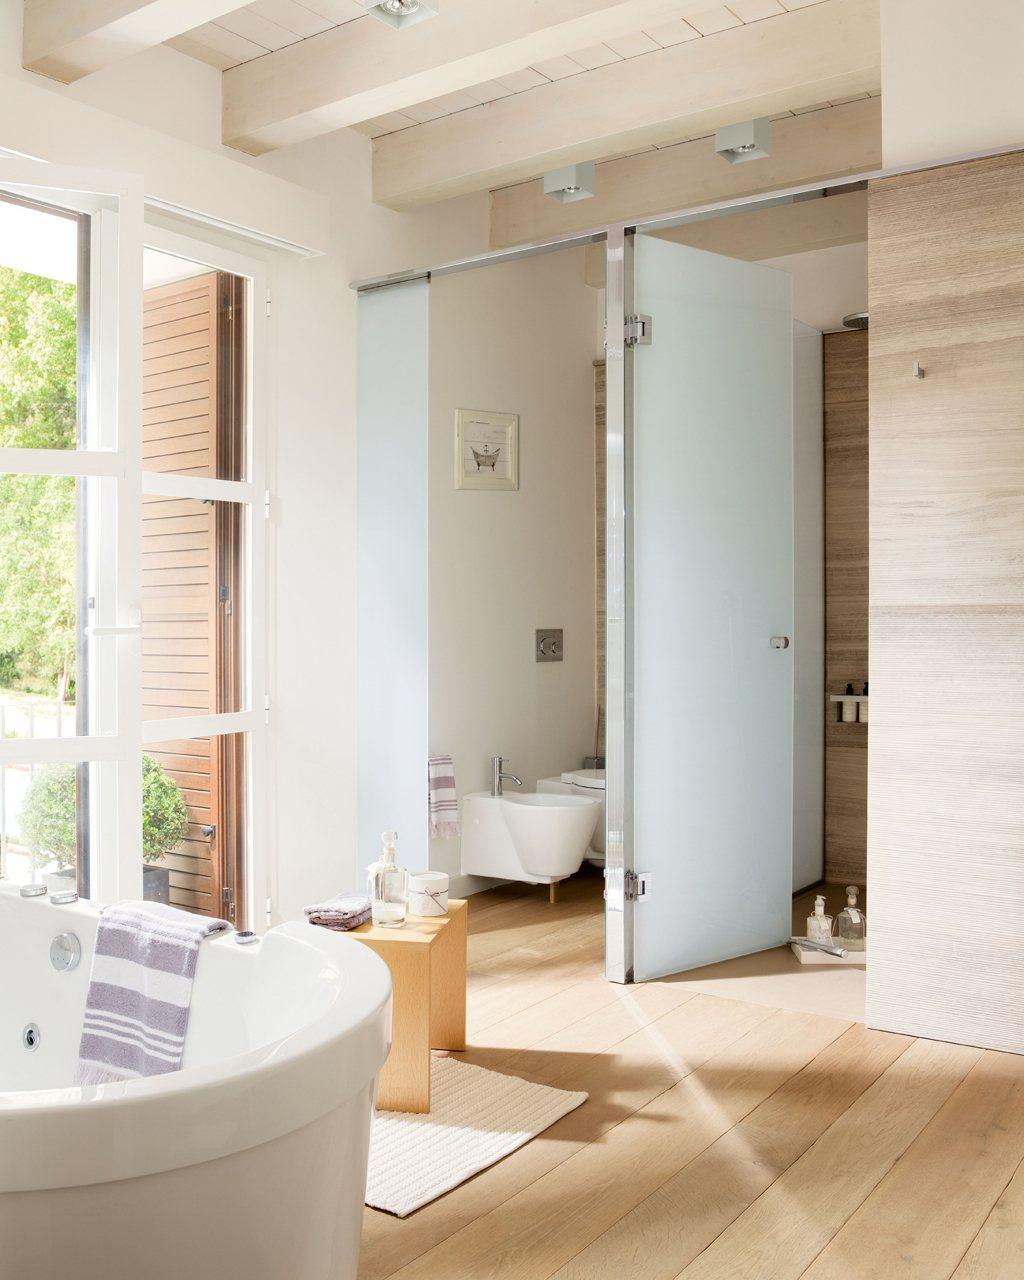 Ideas para decorar espacios peque os y ganar espacio for Puertas corredizas para banos pequenos